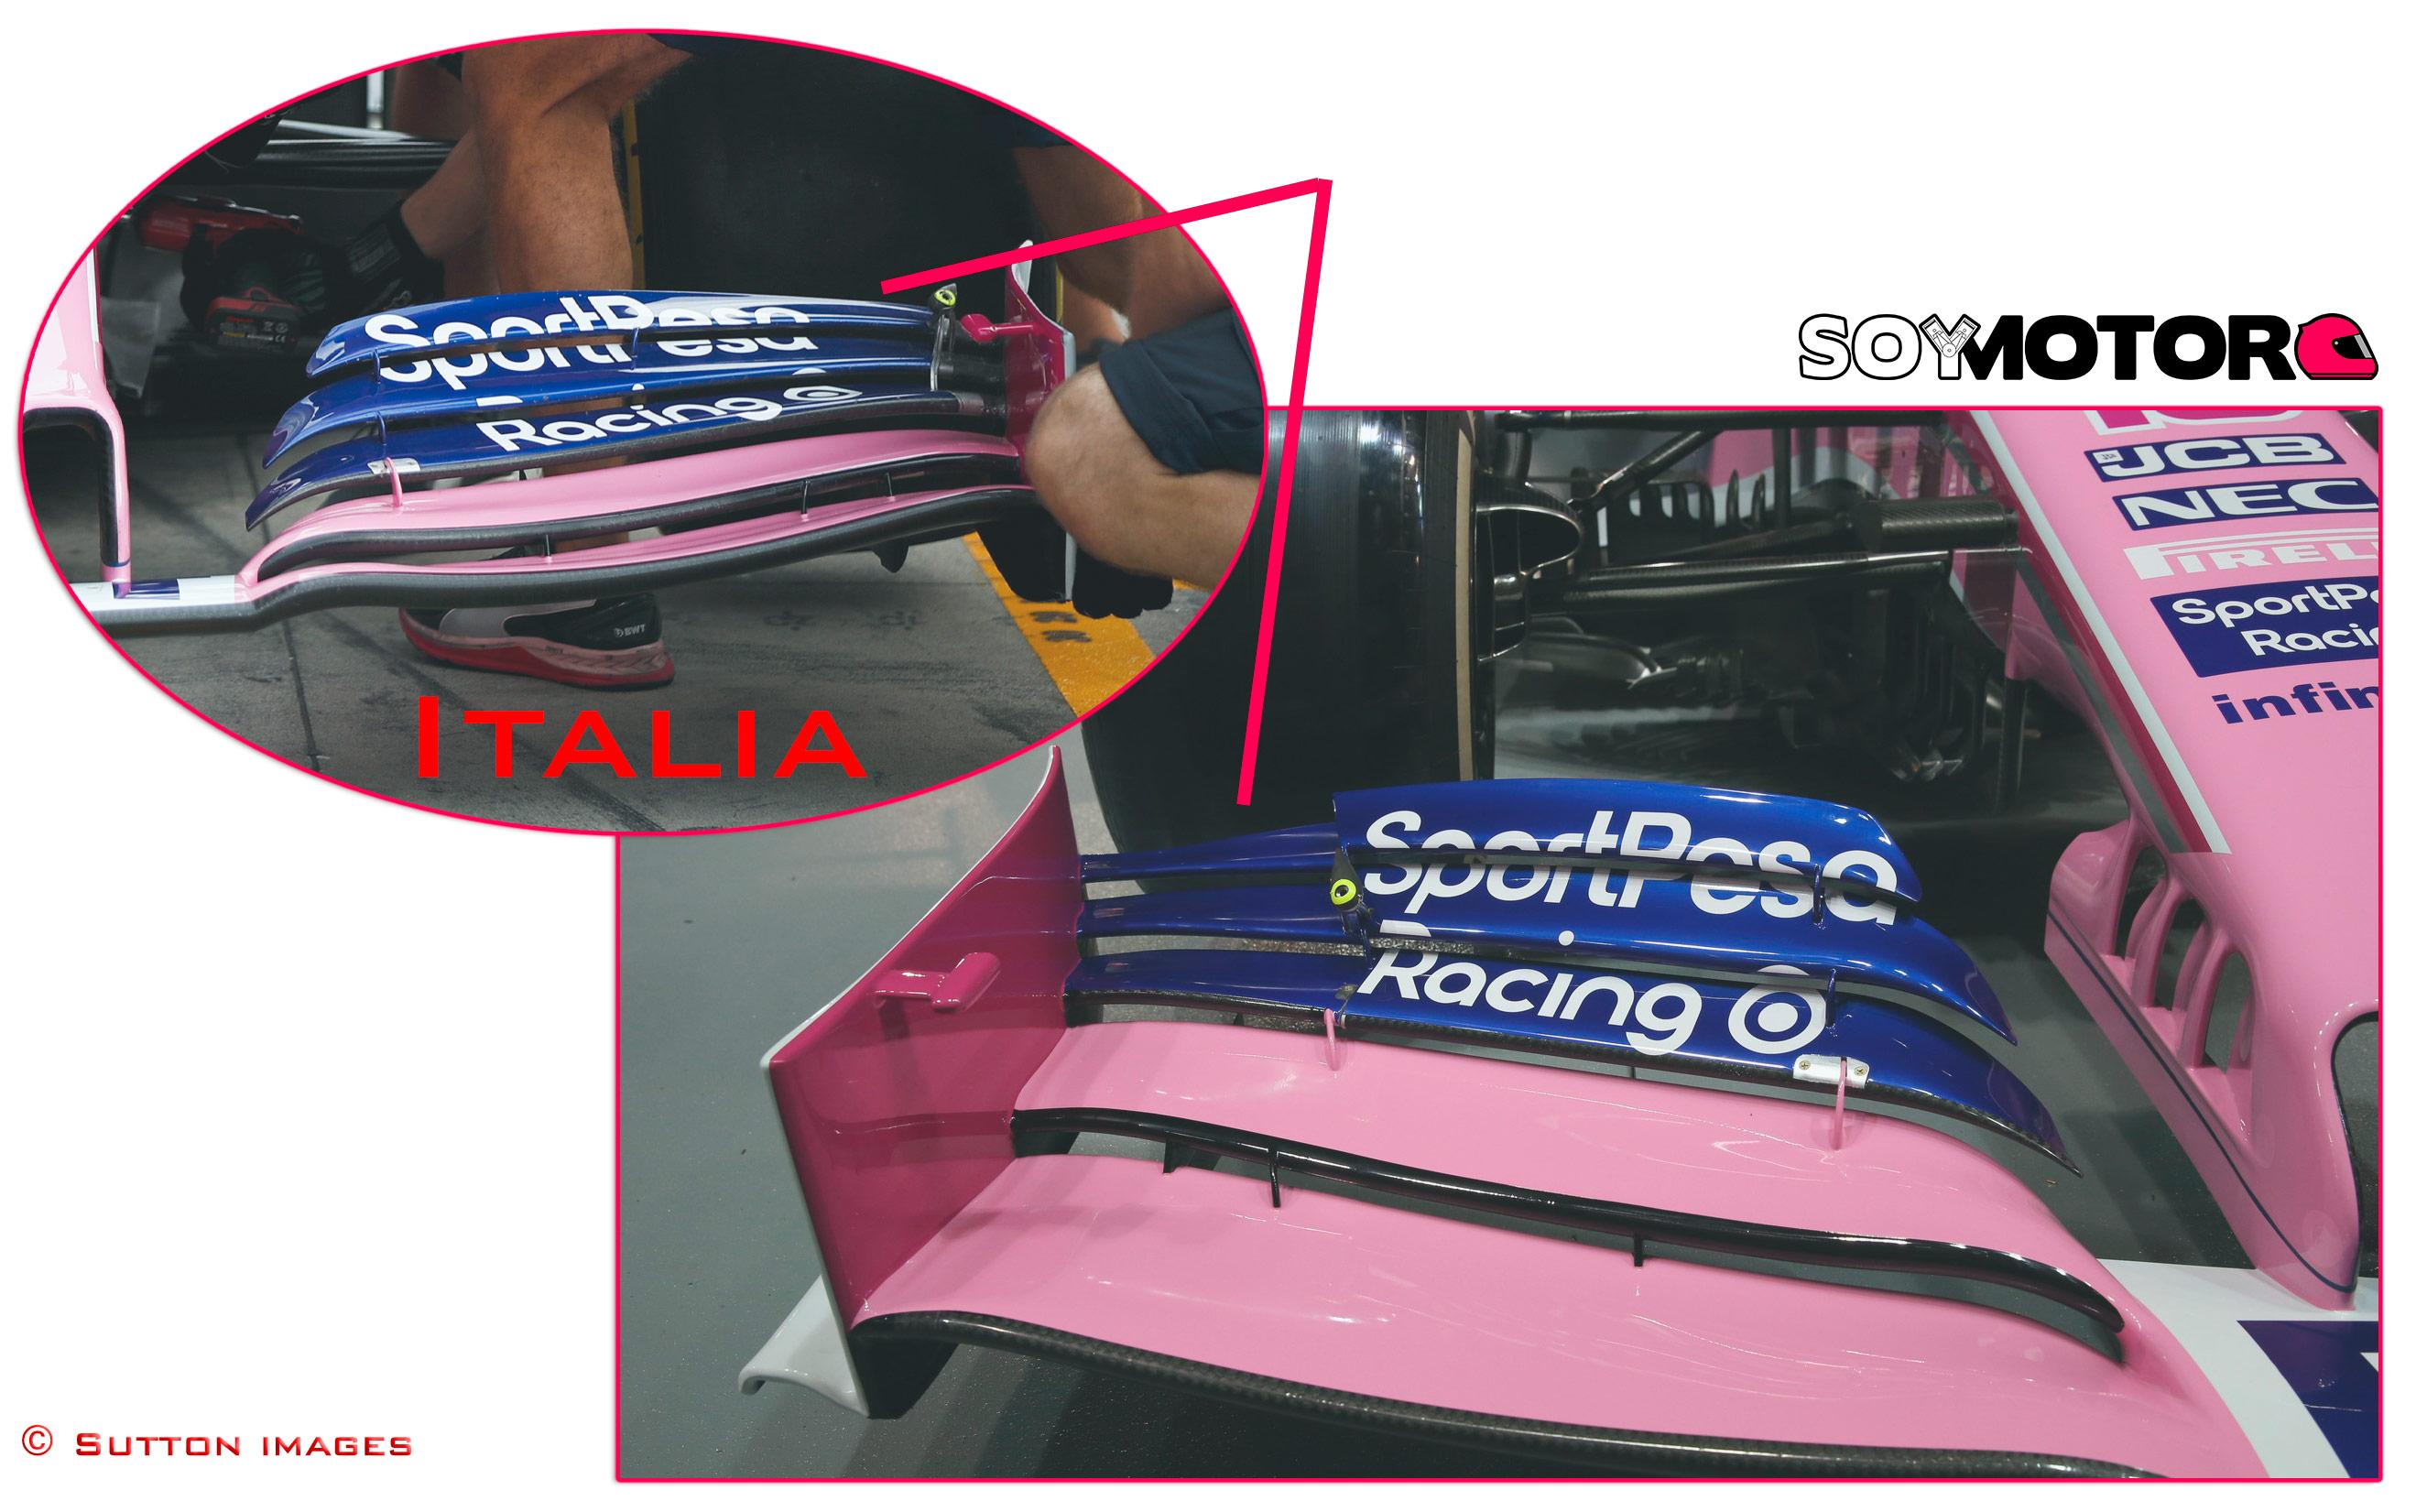 racing-opint-ala-delantera-soymotor.jpg